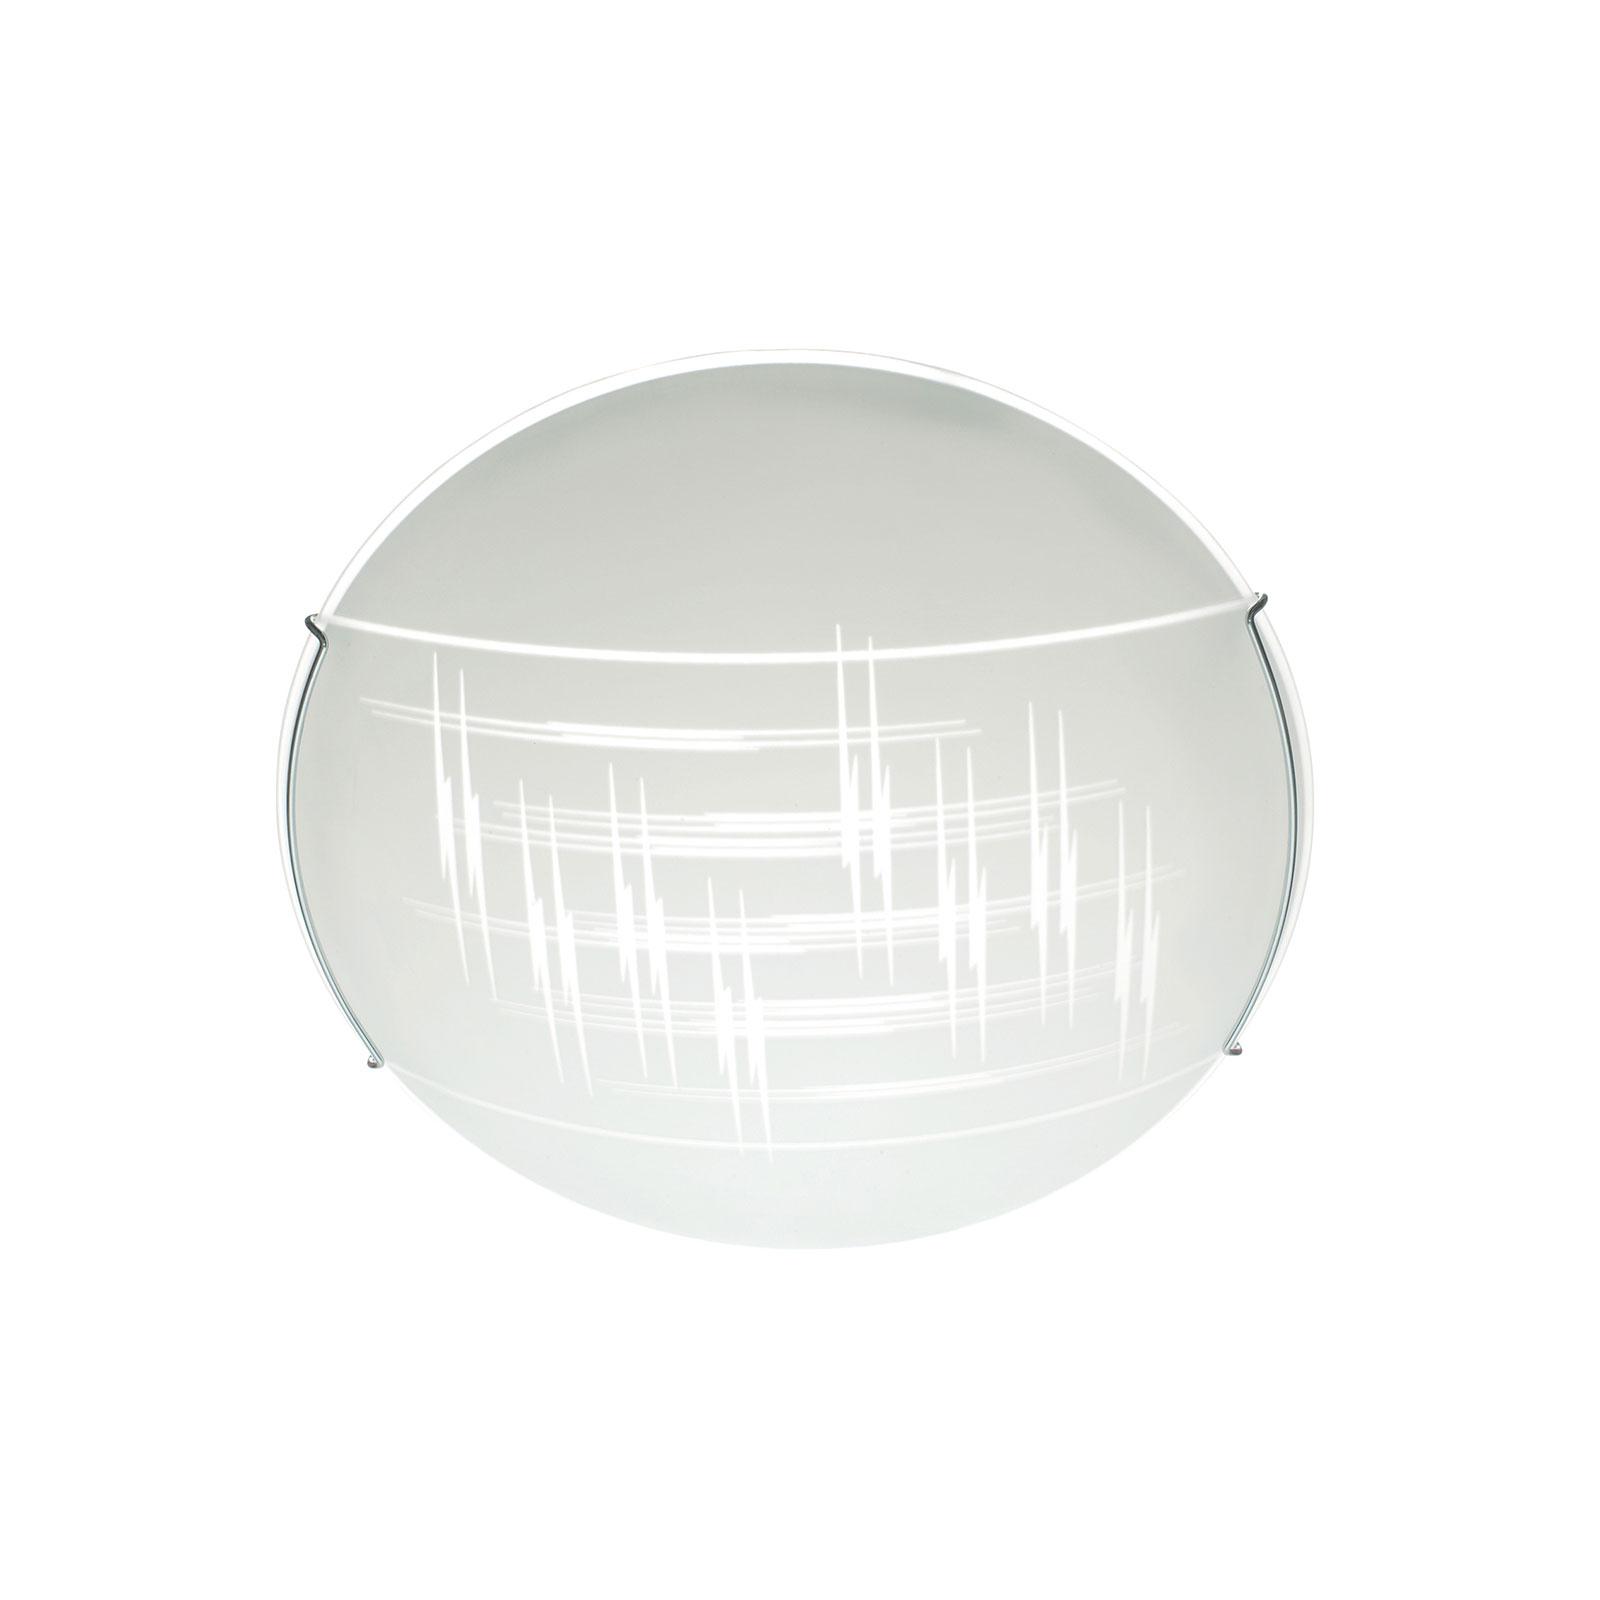 Taklampe Scratch av glass, Ø 30 cm